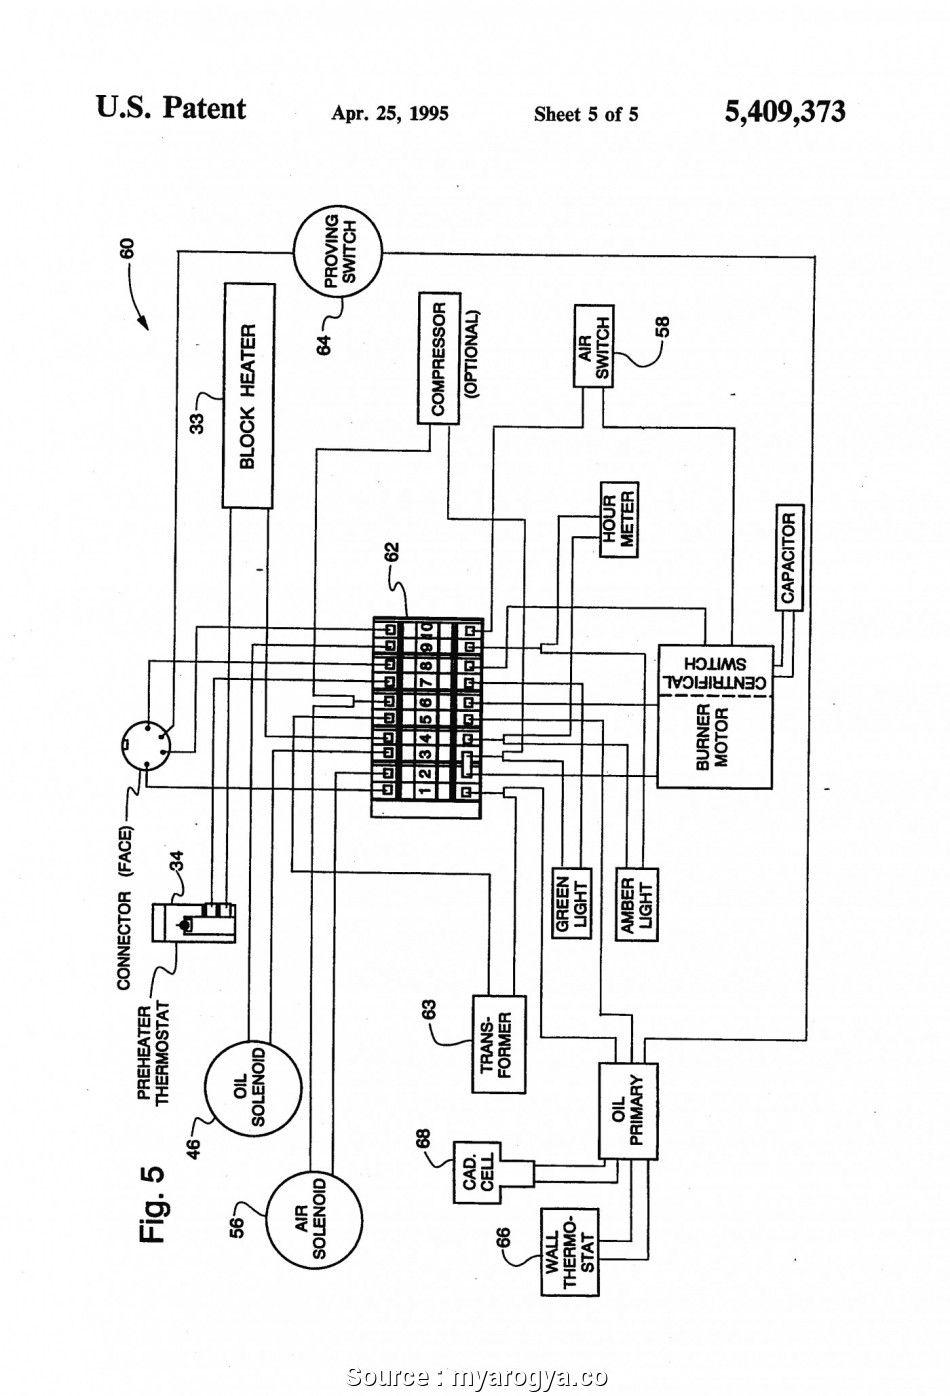 [DIAGRAM] Lennox Furnace Wiring Diagram 16 G FULL Version